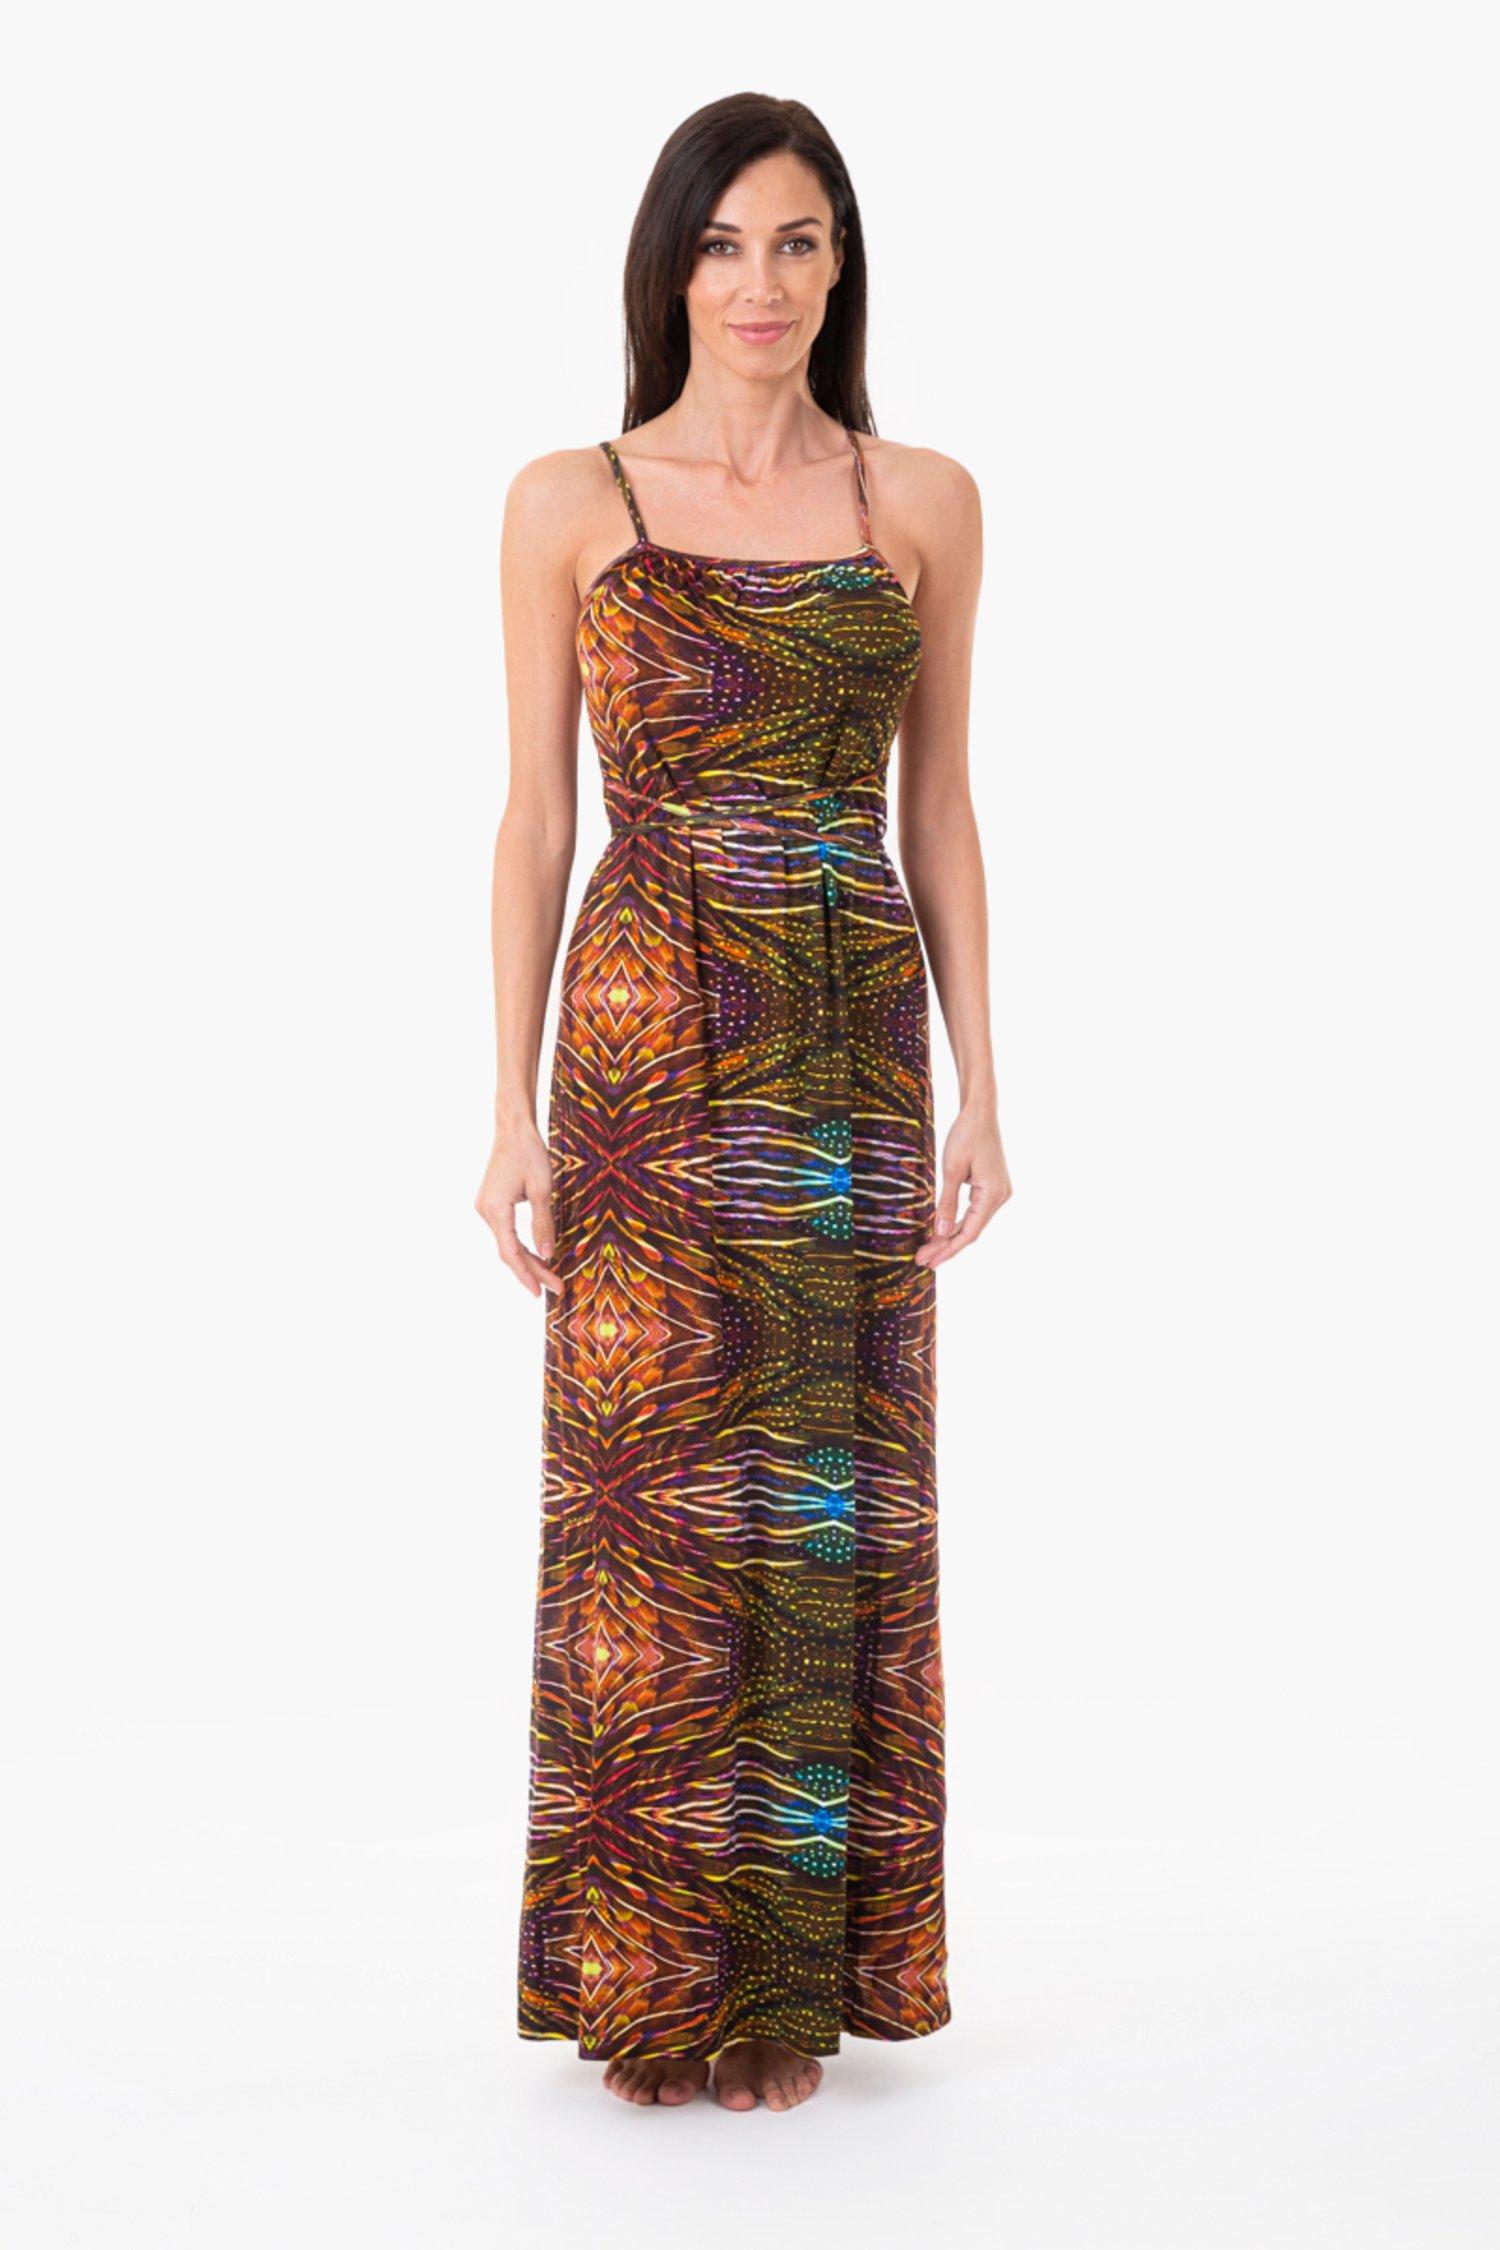 LONG DRESS - Plumage Ambra